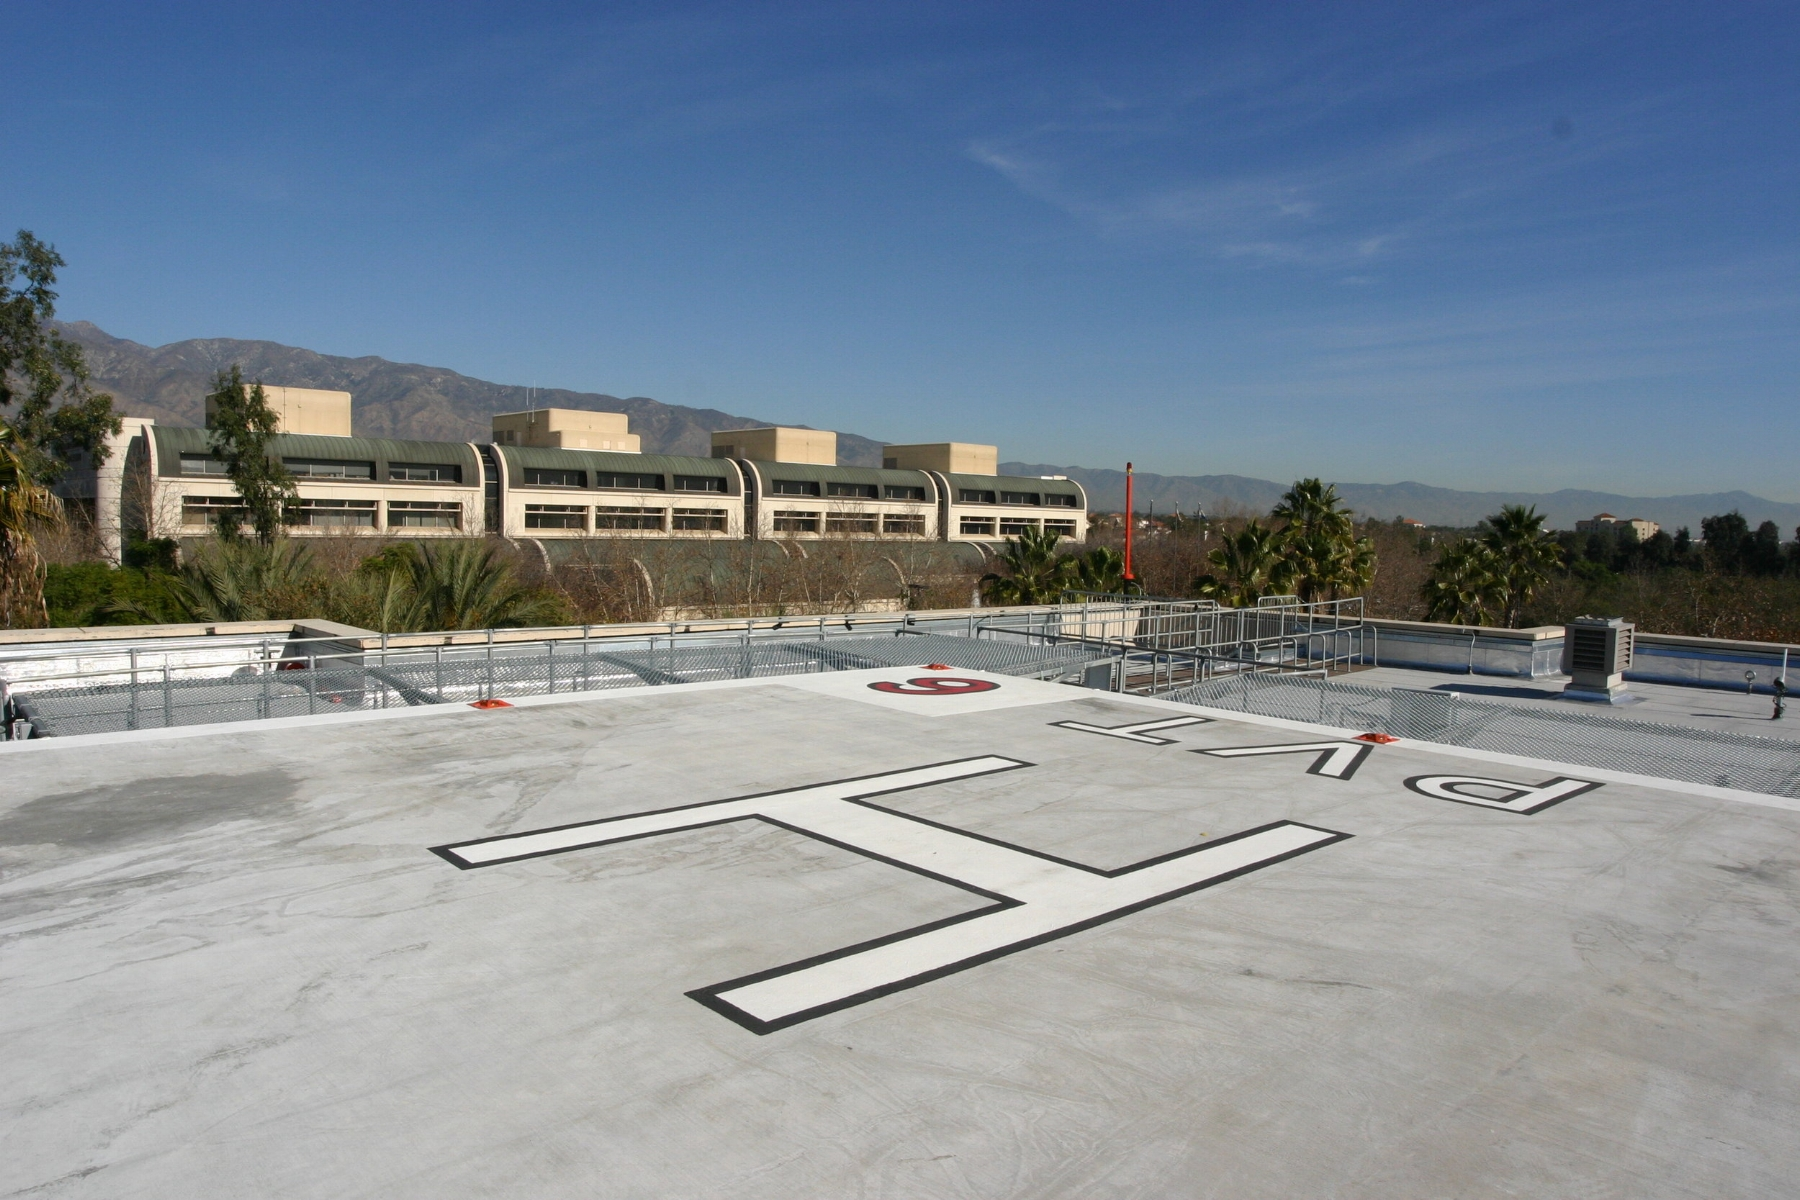 Rancho_Public_Safety_Building_Helipad